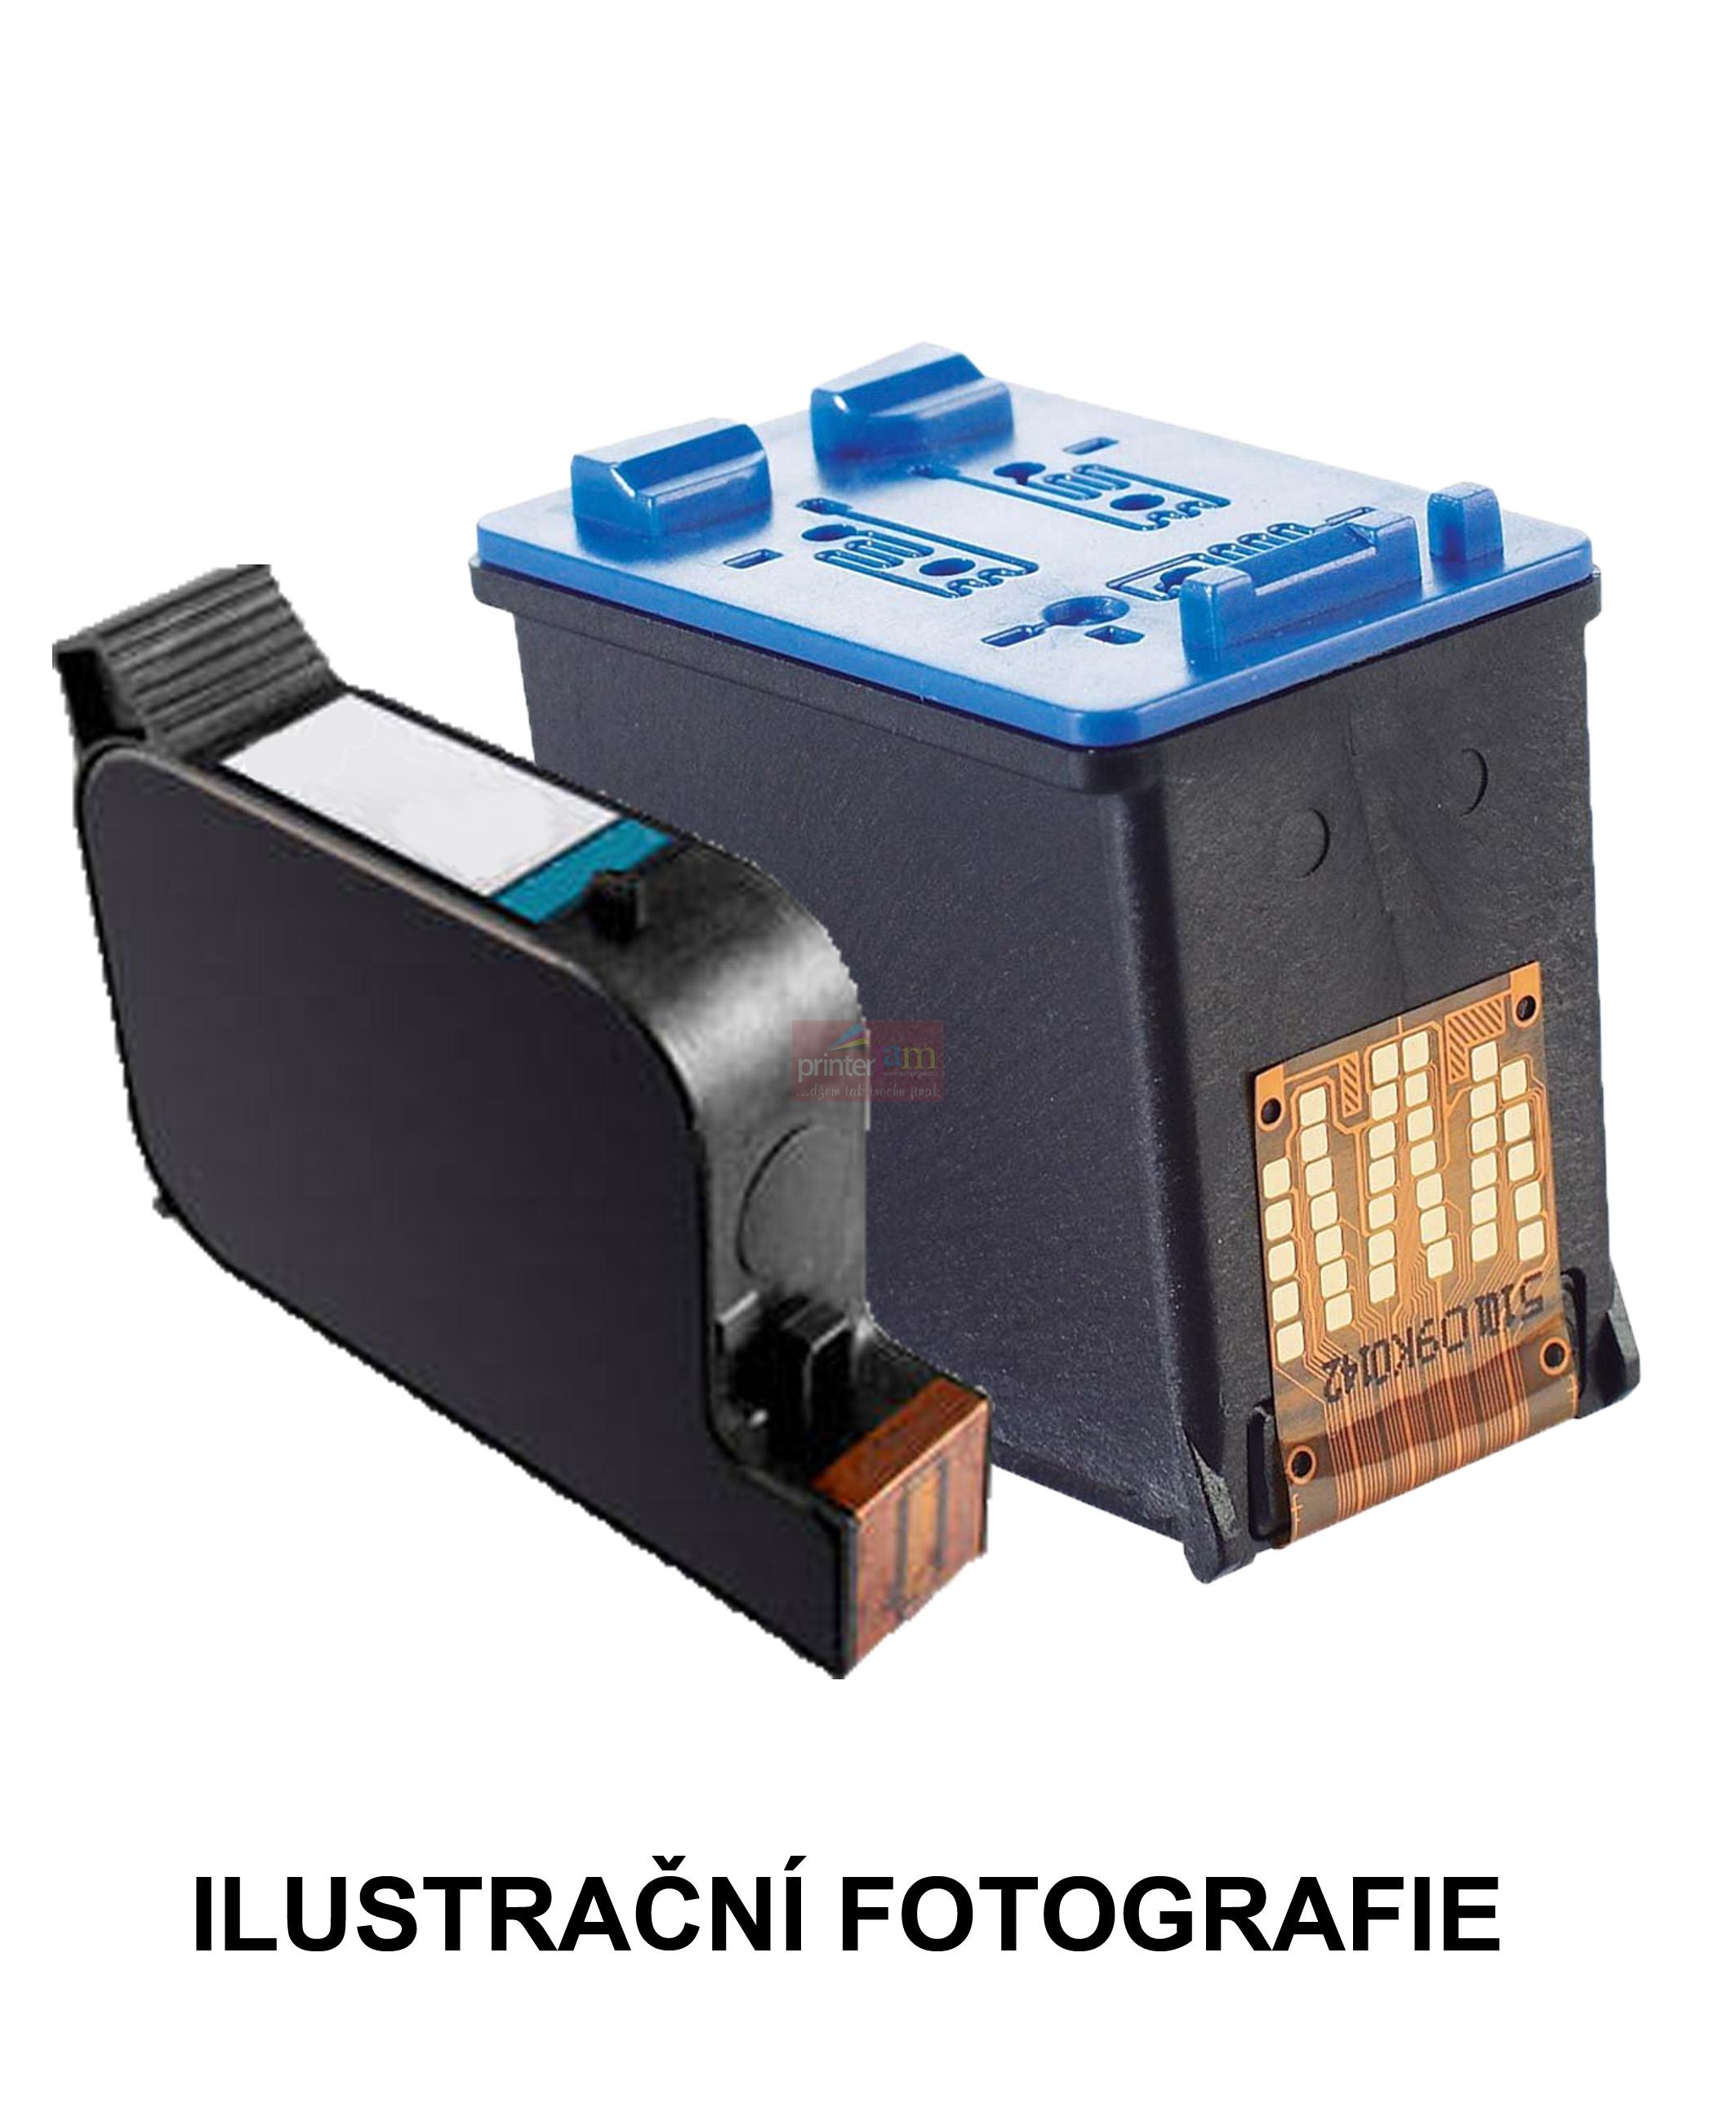 ink-jet pro Canon iP4850 grey, 9 ml, originál